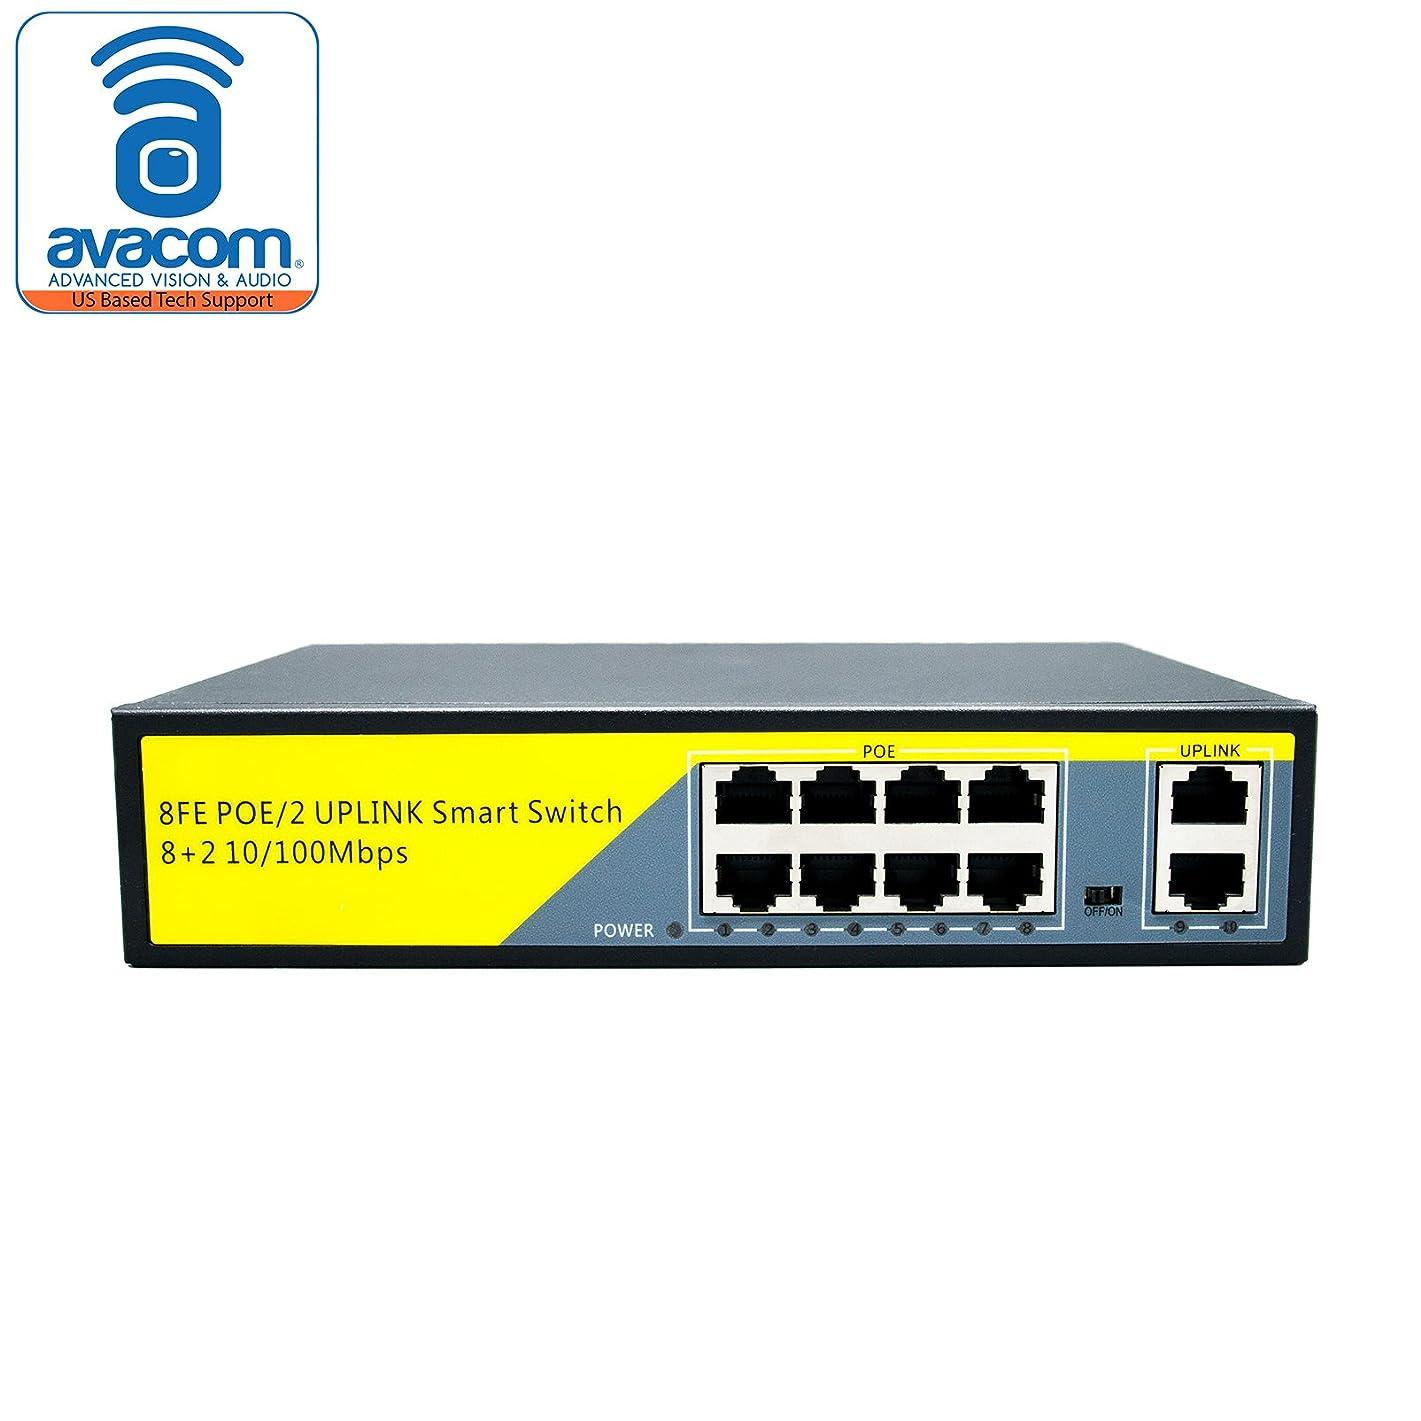 AVACOM Uplink 10-Port PoE Ethernet Switch with Metal Housing, Unmanaged, 802.3AT, 802.3 AF 800 feet (1010B)